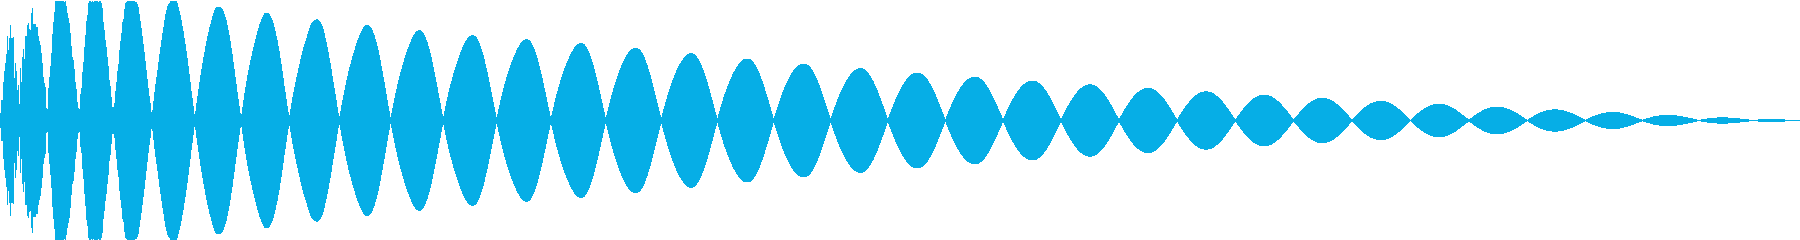 DTM Kick 96 オリジナル音源の再生済みの波形